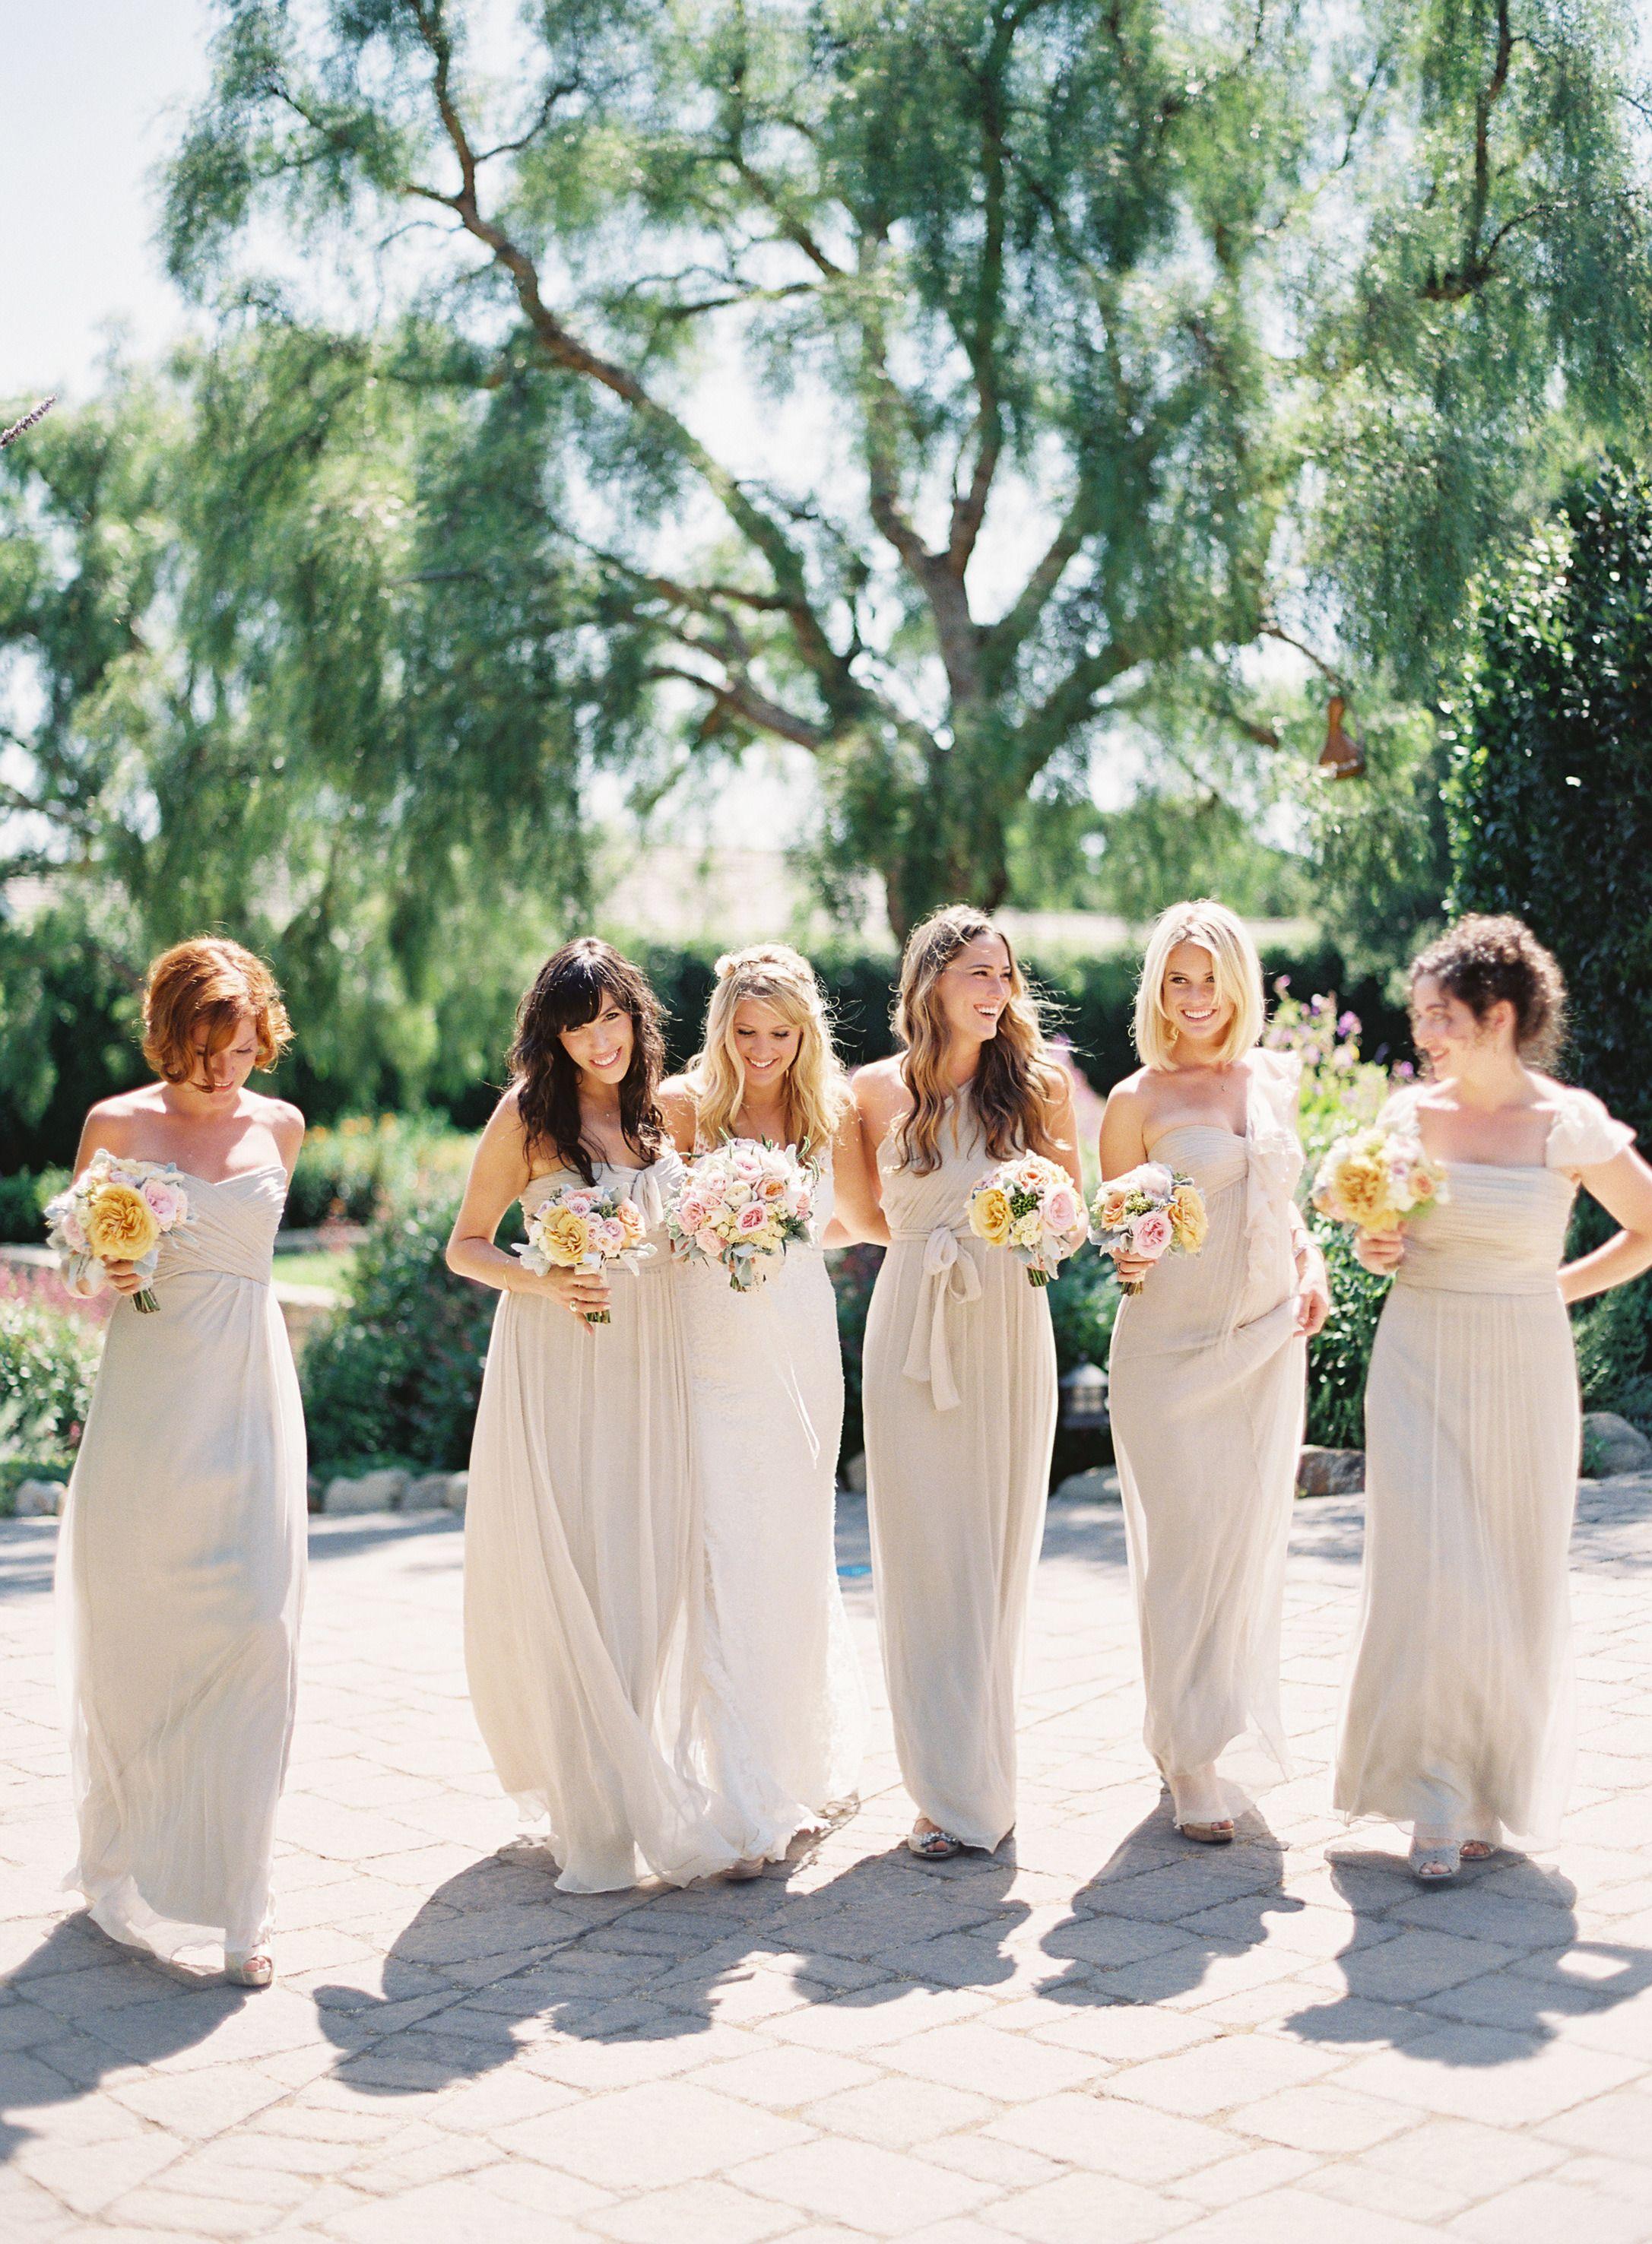 San Ysidro Ranch Wedding From Patrick Moyer Photography Matching Bridesmaids Dresses Bridesmaid Wedding Bridesmaid Dresses [ 2952 x 2173 Pixel ]